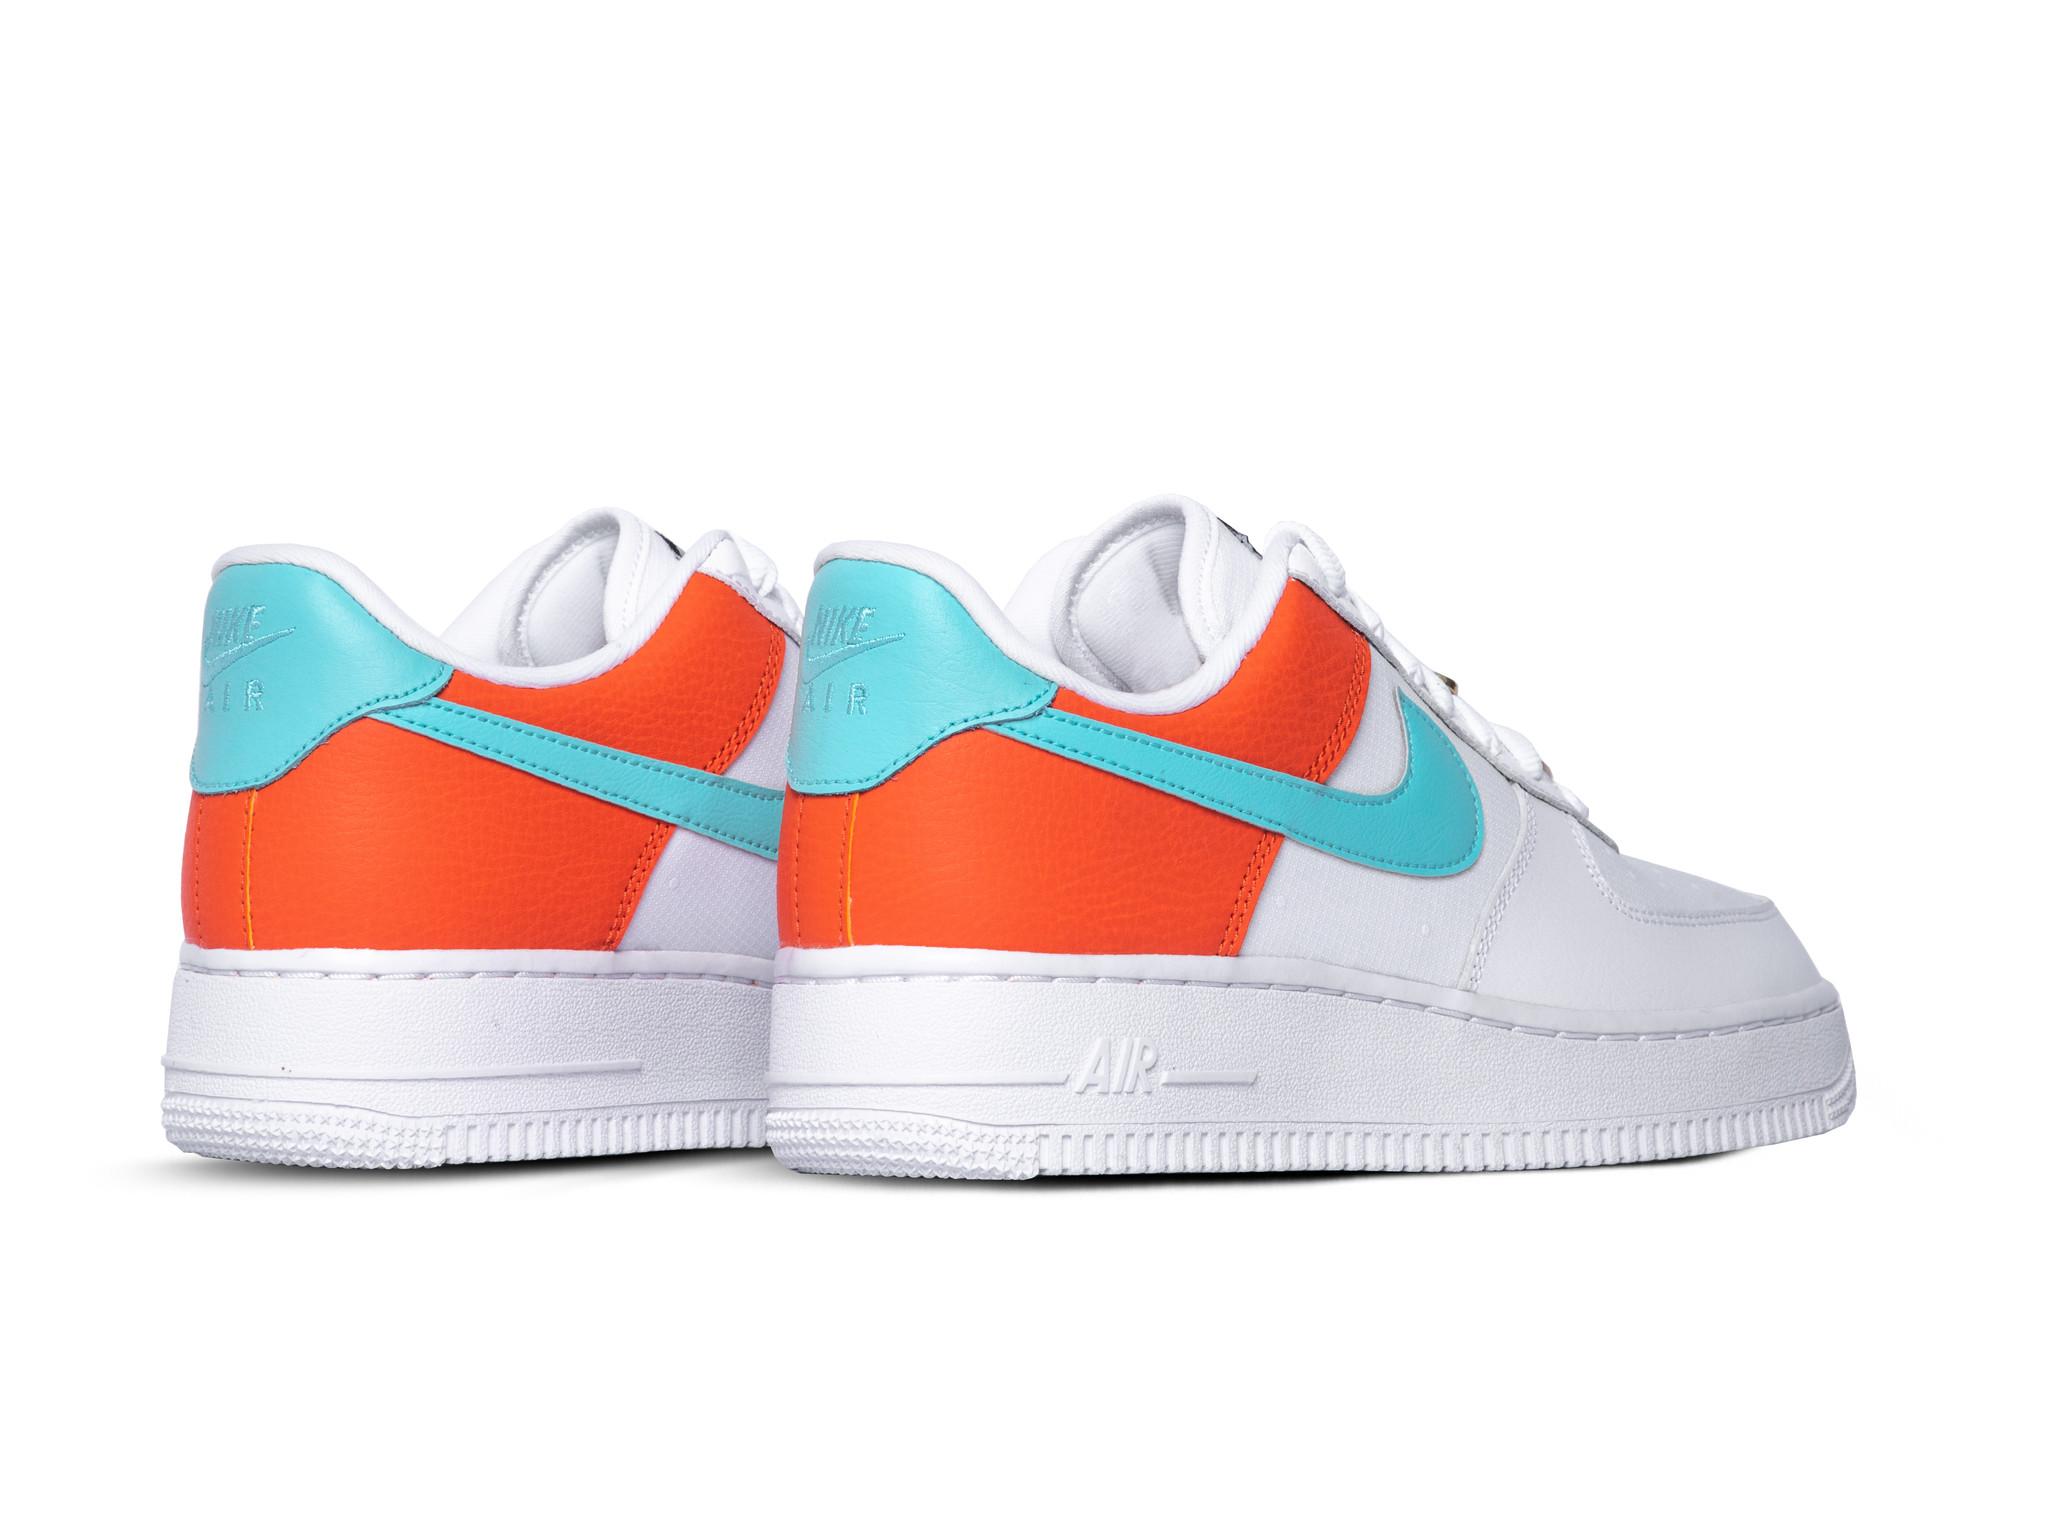 Nike WMNS Air Force 1 '07 (White Light Blue)